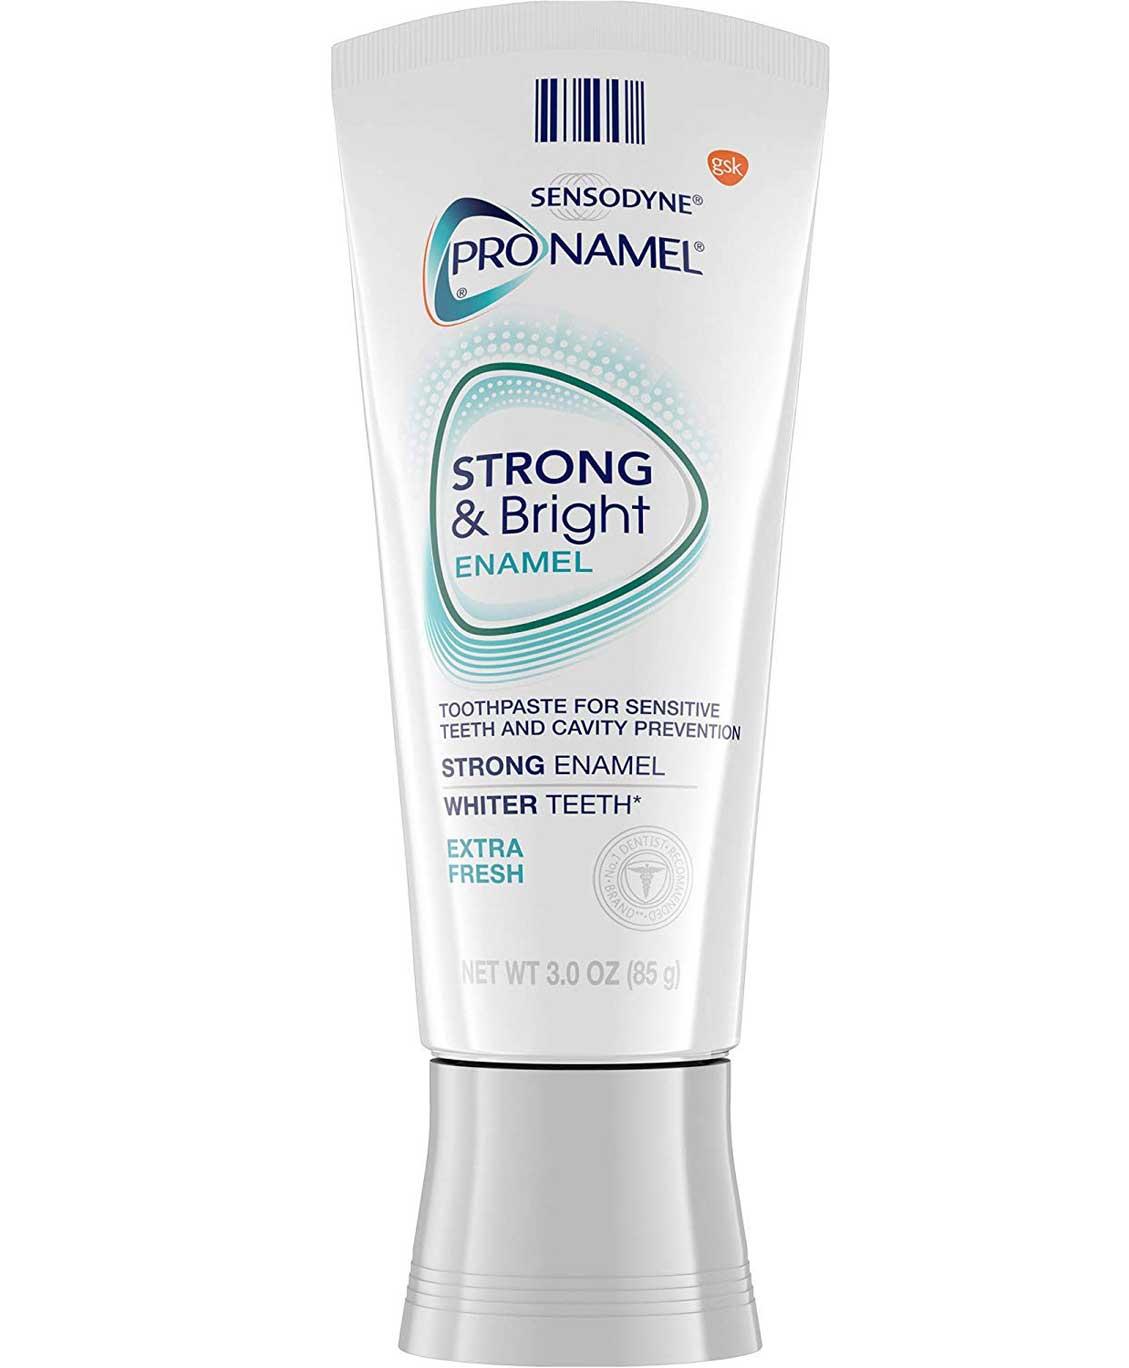 Sensodyne ProNamel Strong & Bright Enamel Extra Fresh Toothpaste, 3 oz